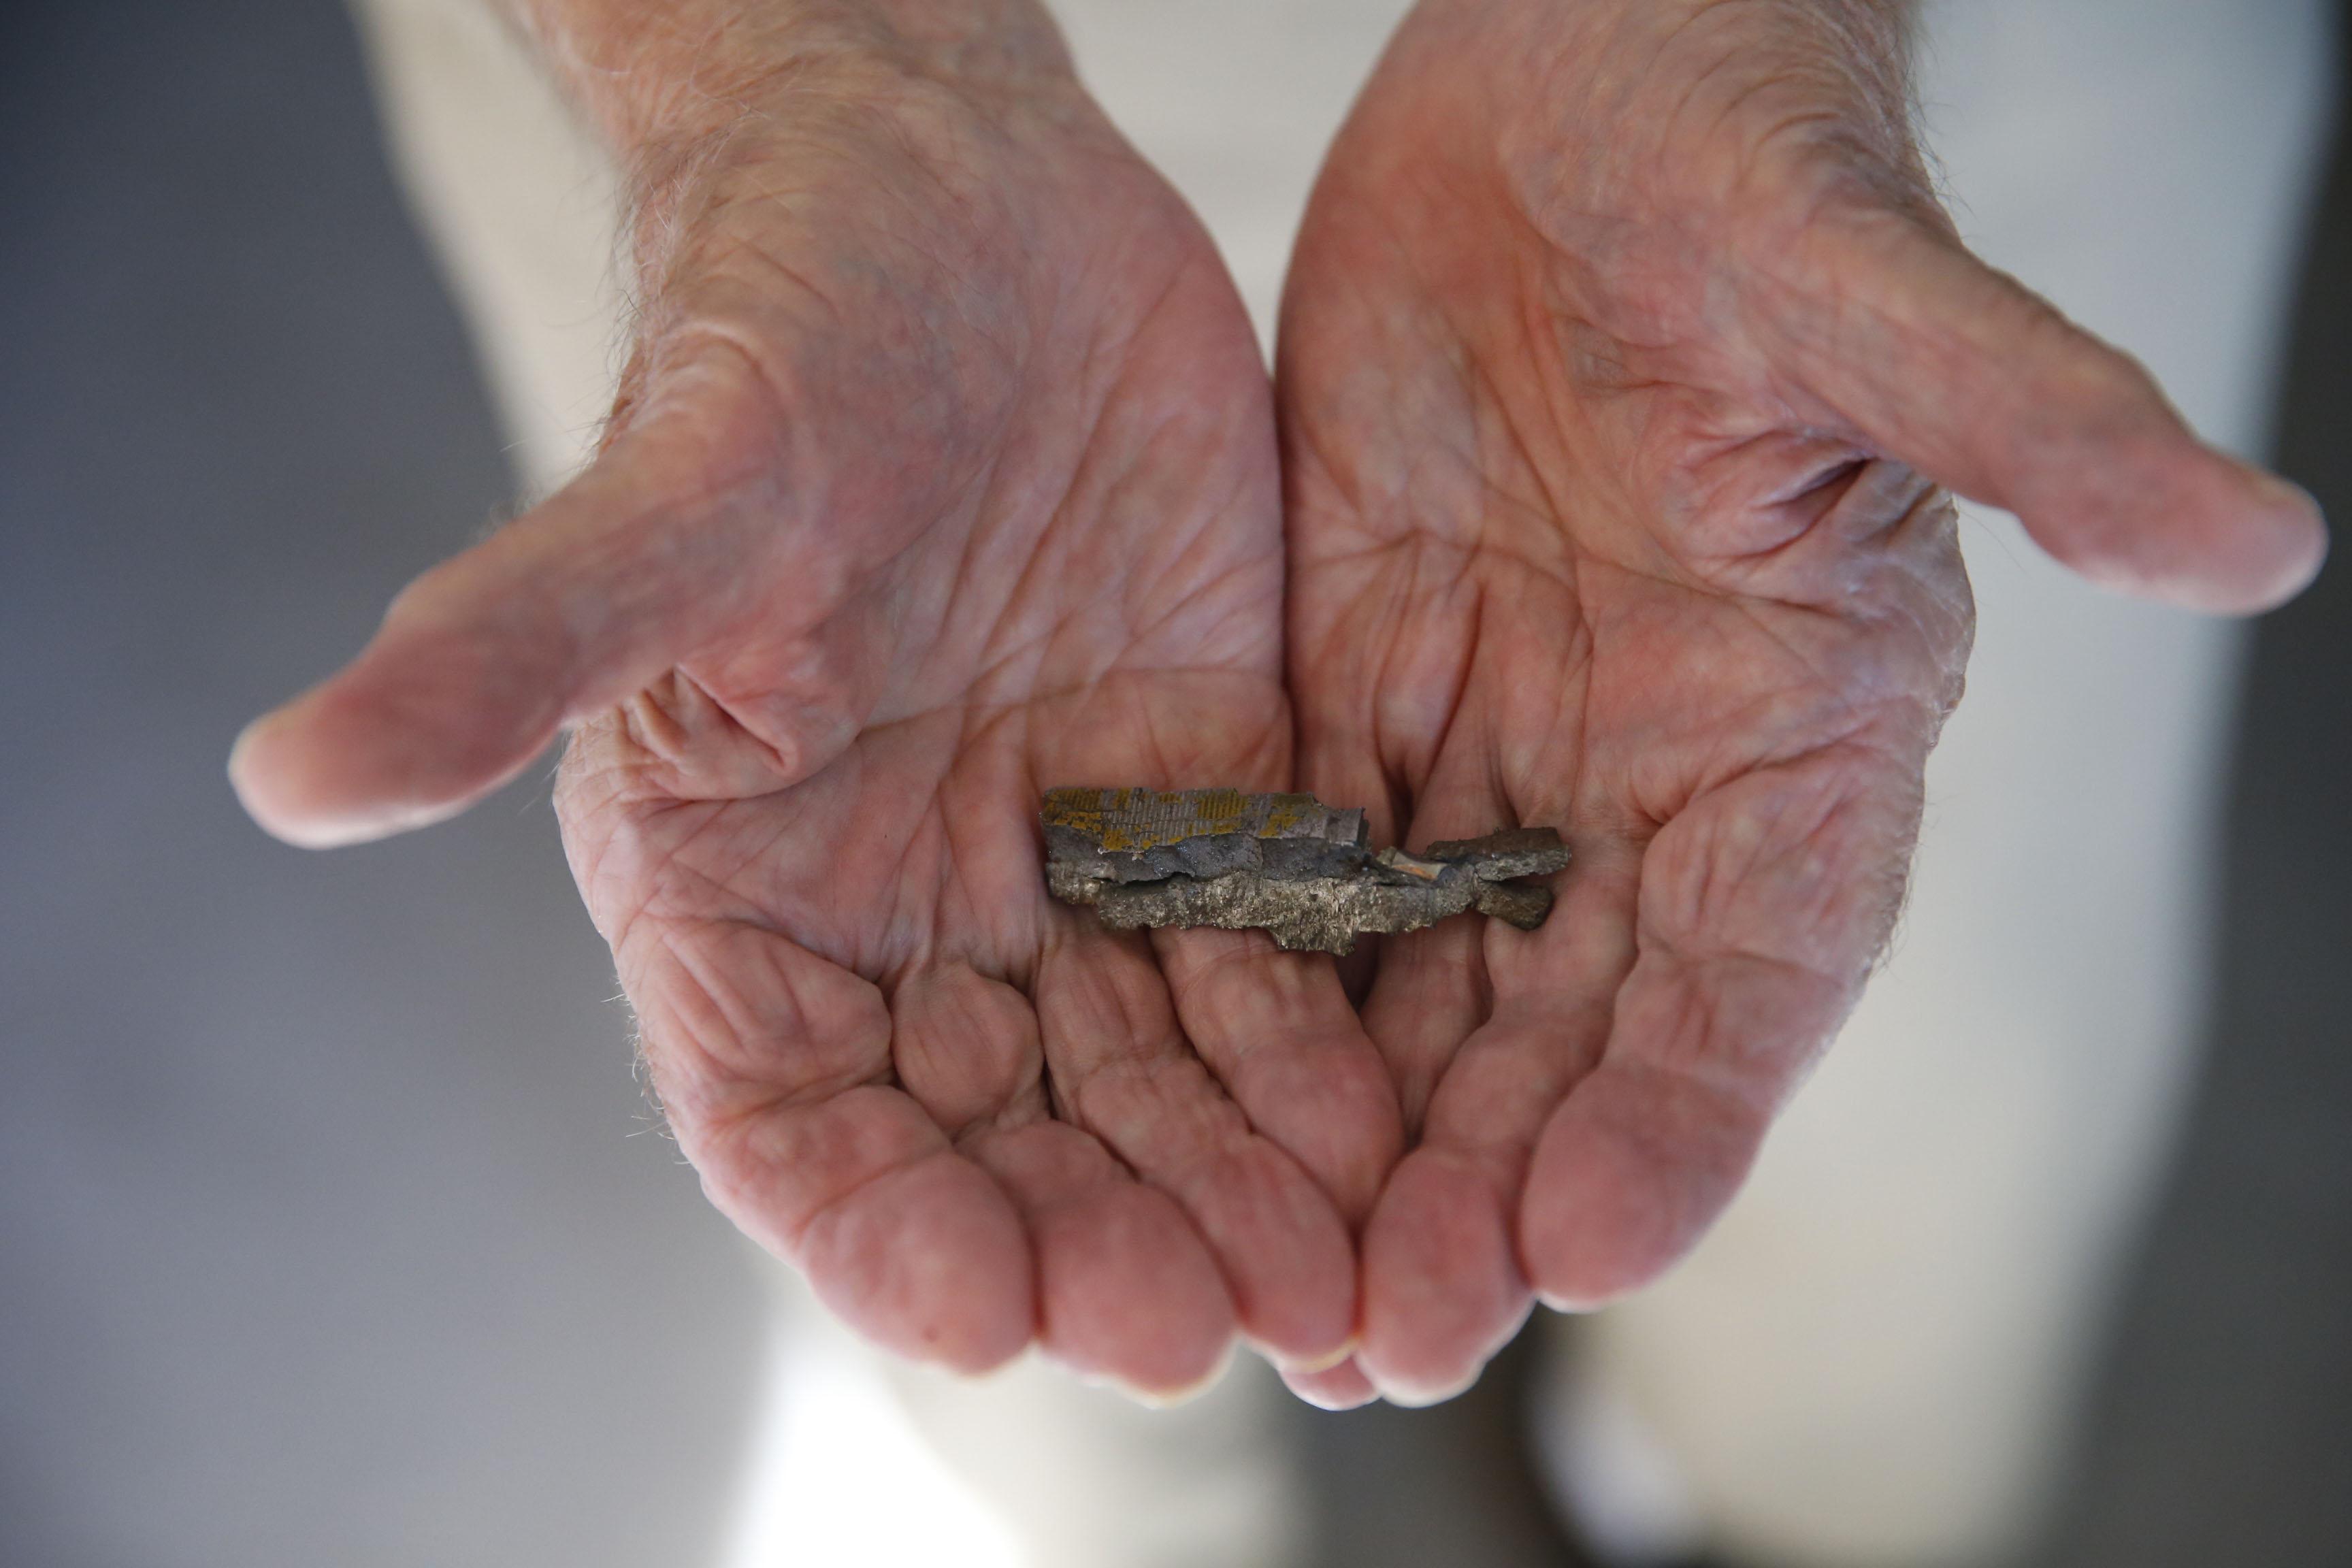 World War II Army Air Corps vet Edward H. Kaczmarek has a piece of flak he kept from one of the 51 bombing runs he participated in. The flak from German anti-aircraft guns. Friday, Oct. 7, 2016. (Robert Kirkham/Buffalo News)